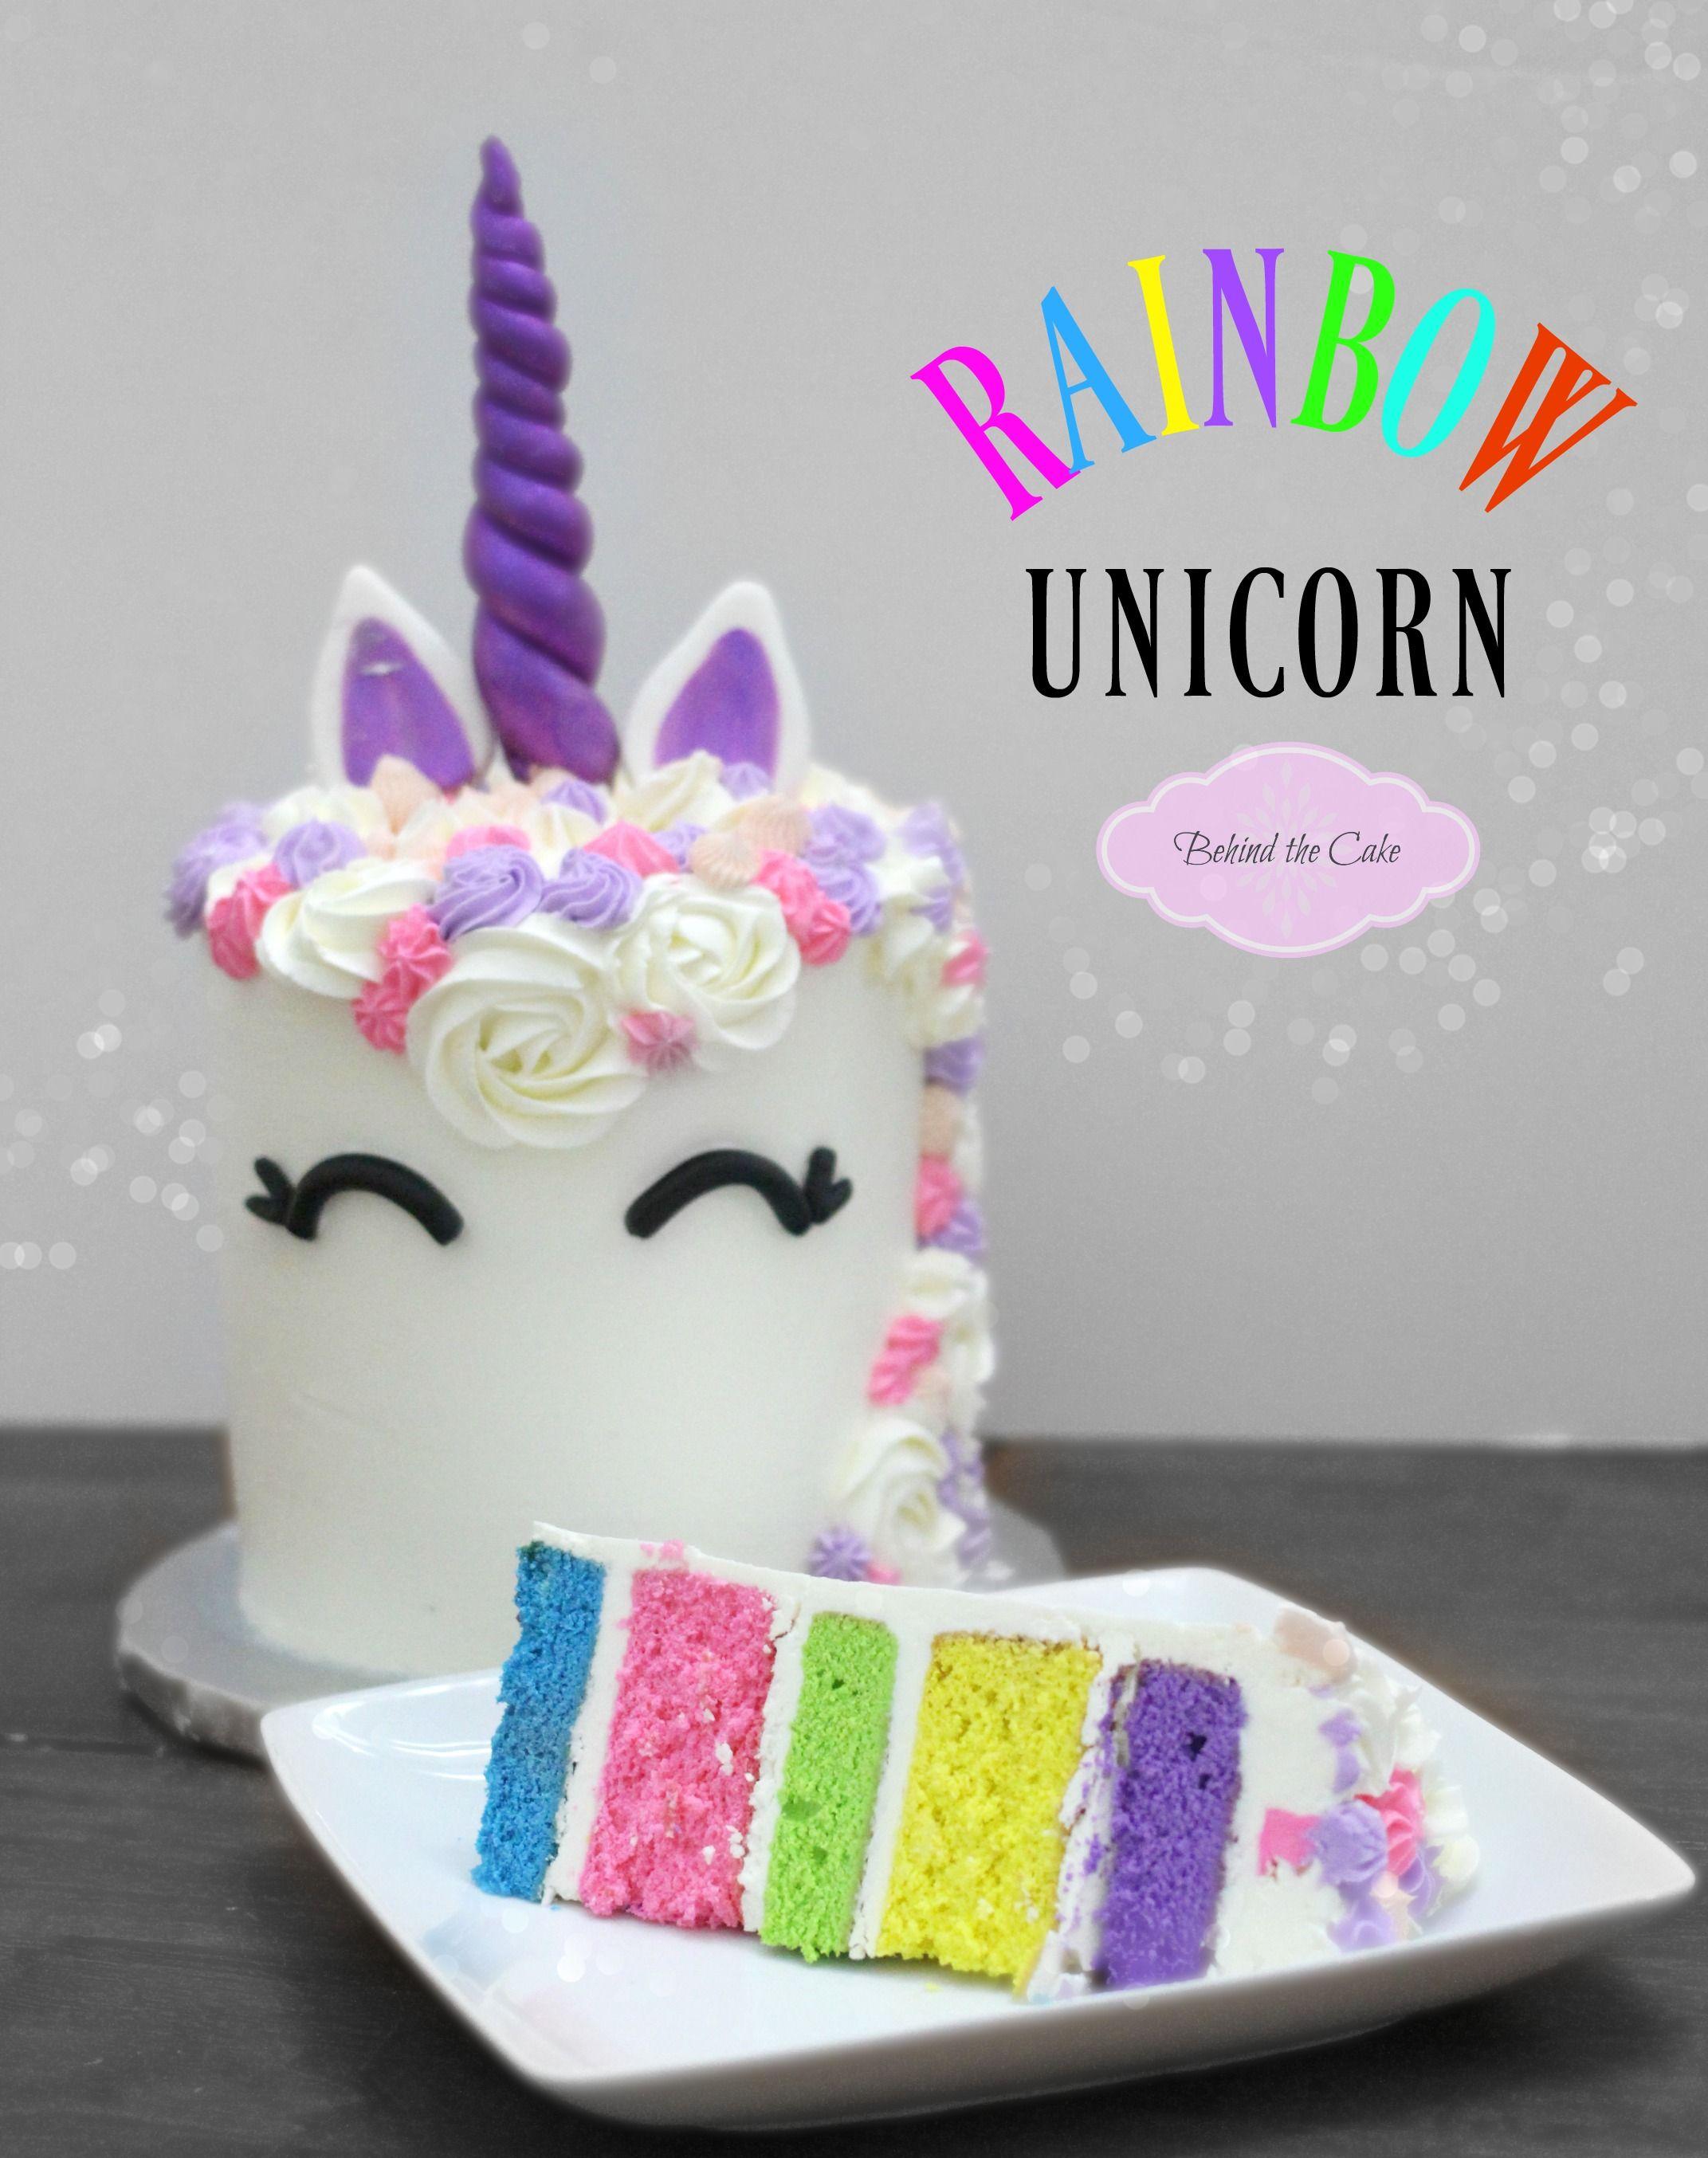 How To Paint A Rainbow Unicorn Unicorn Painting Unicorn Drawing